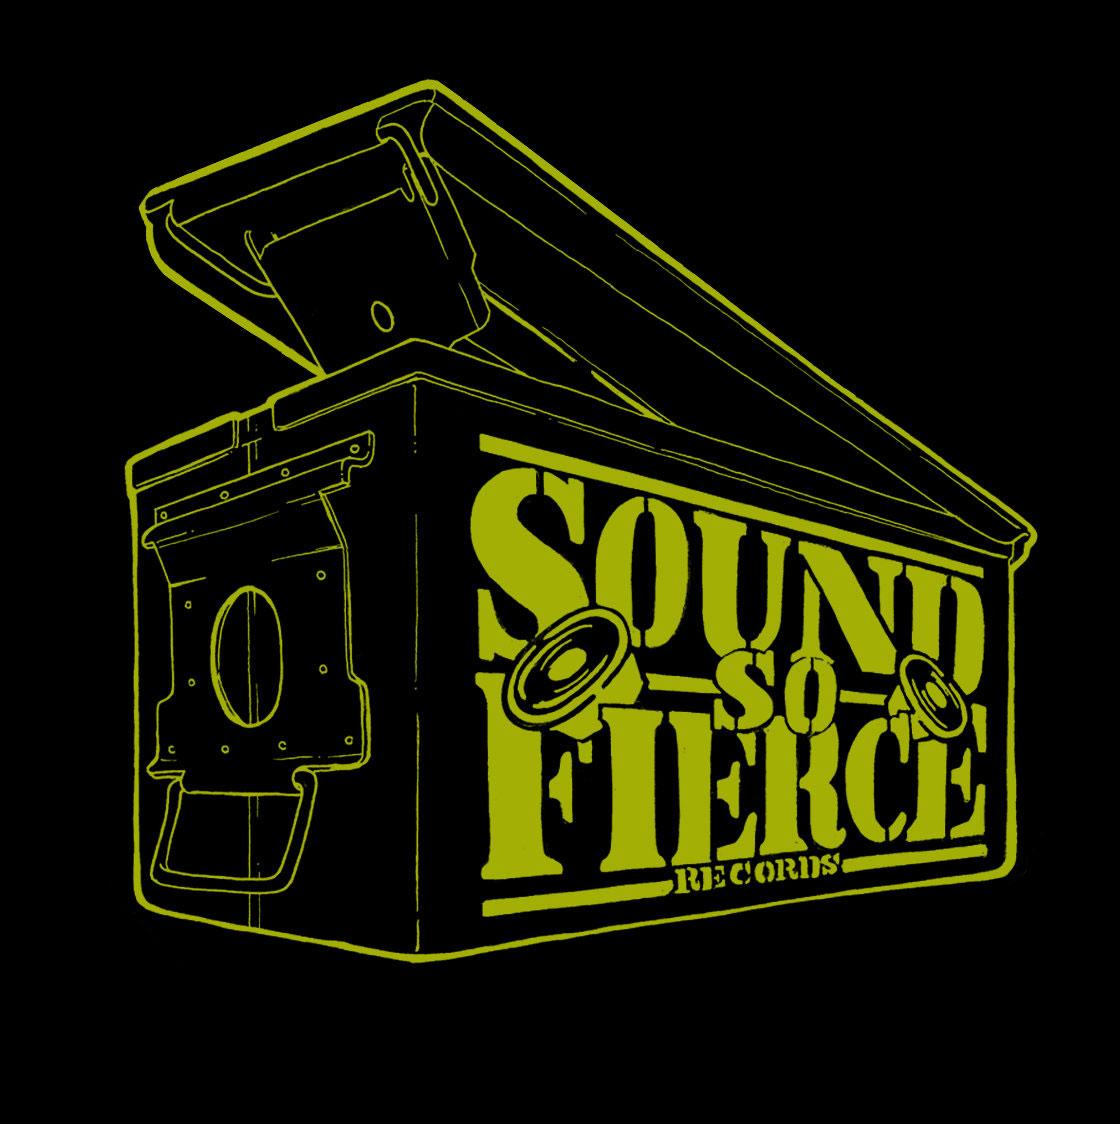 soundsofierce